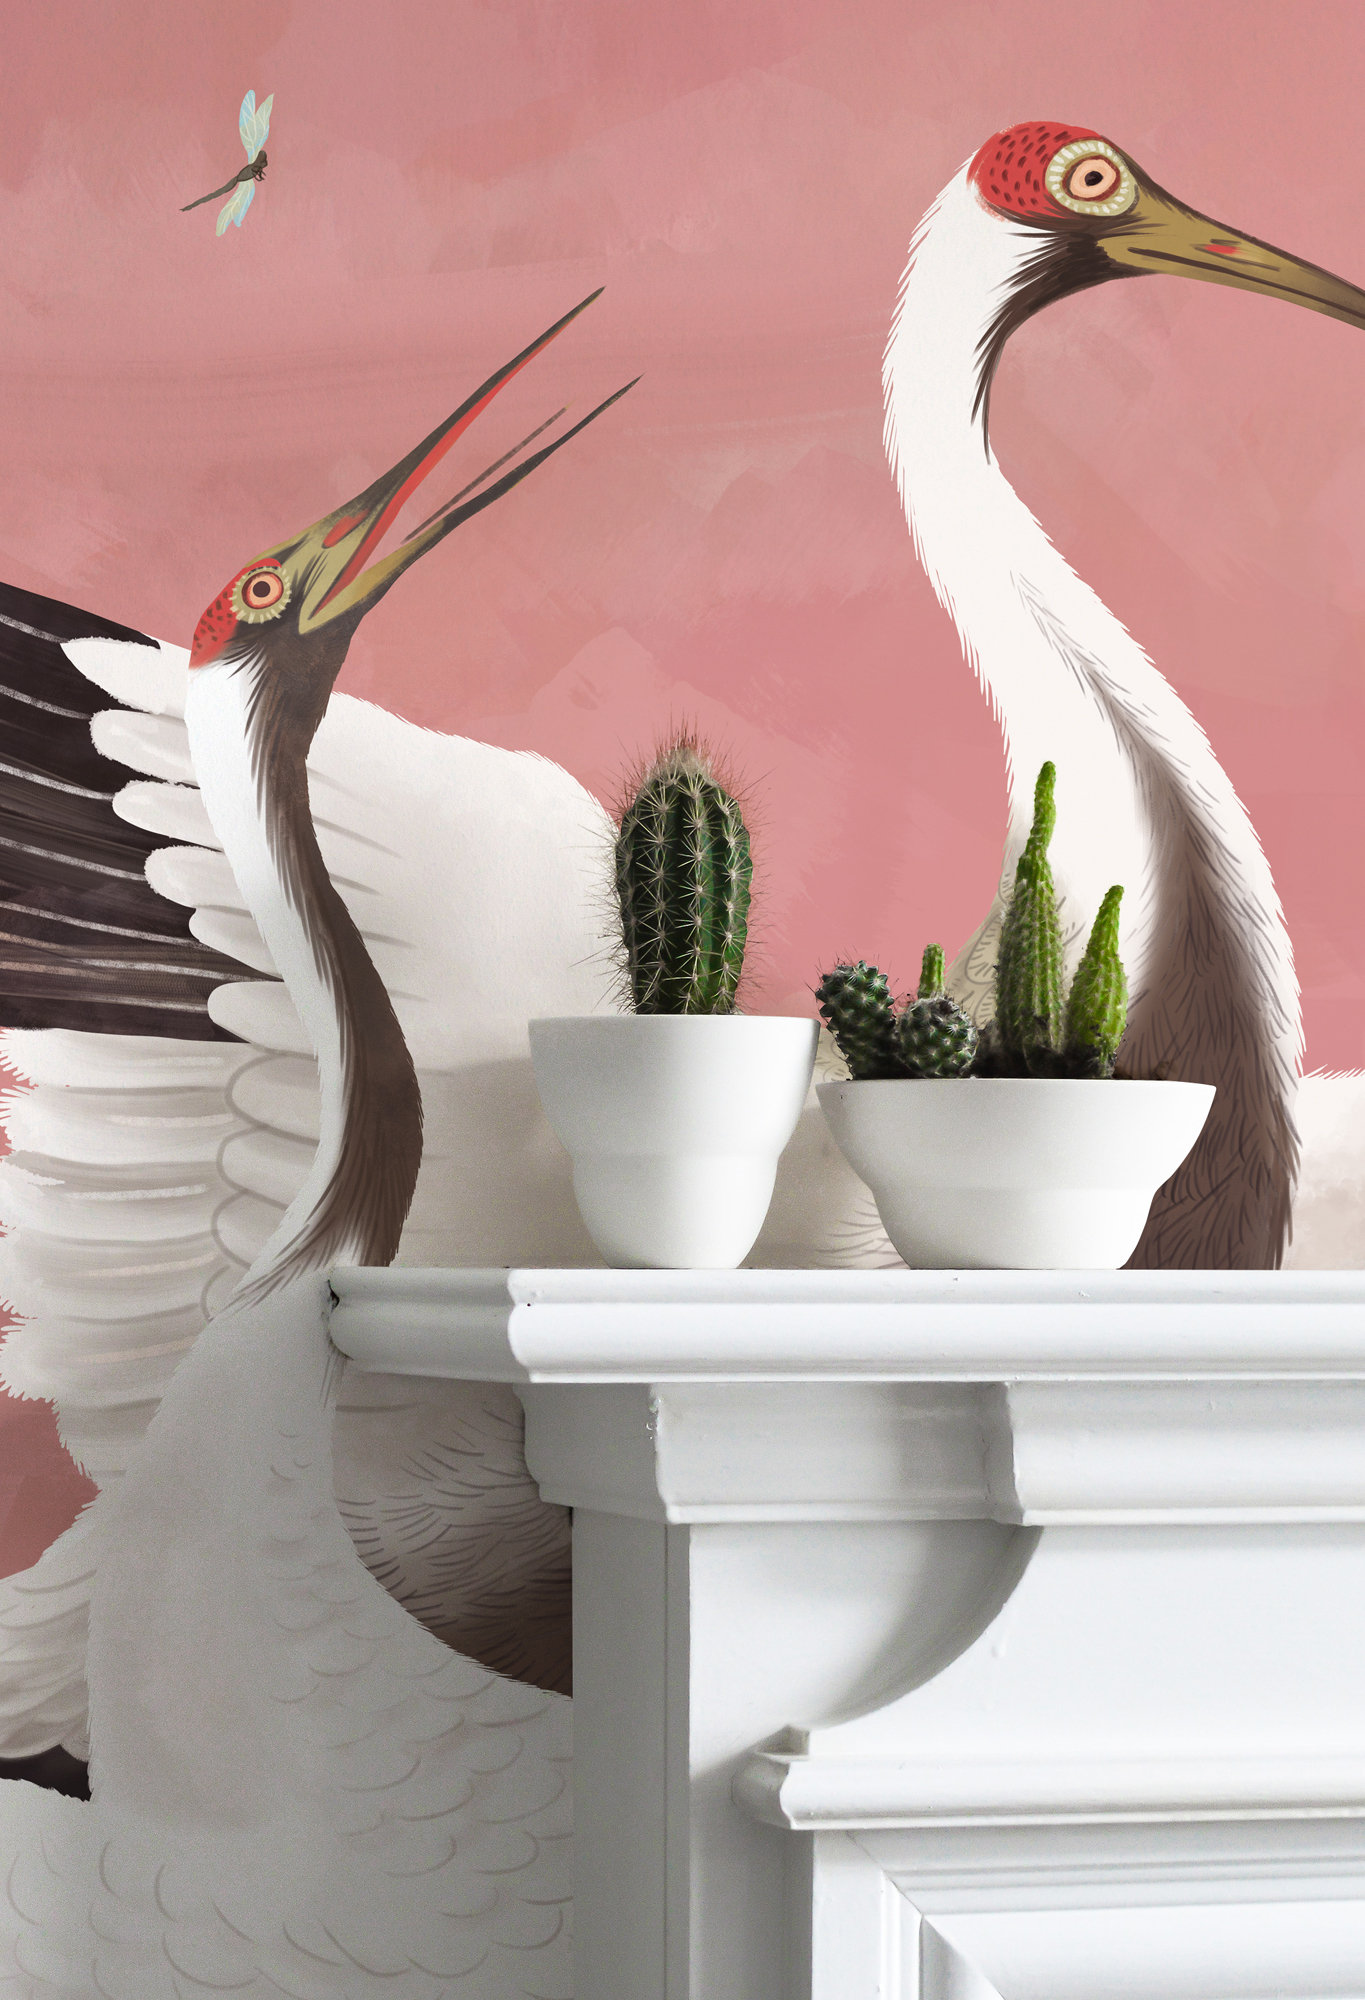 print hd Heron Wallpaper